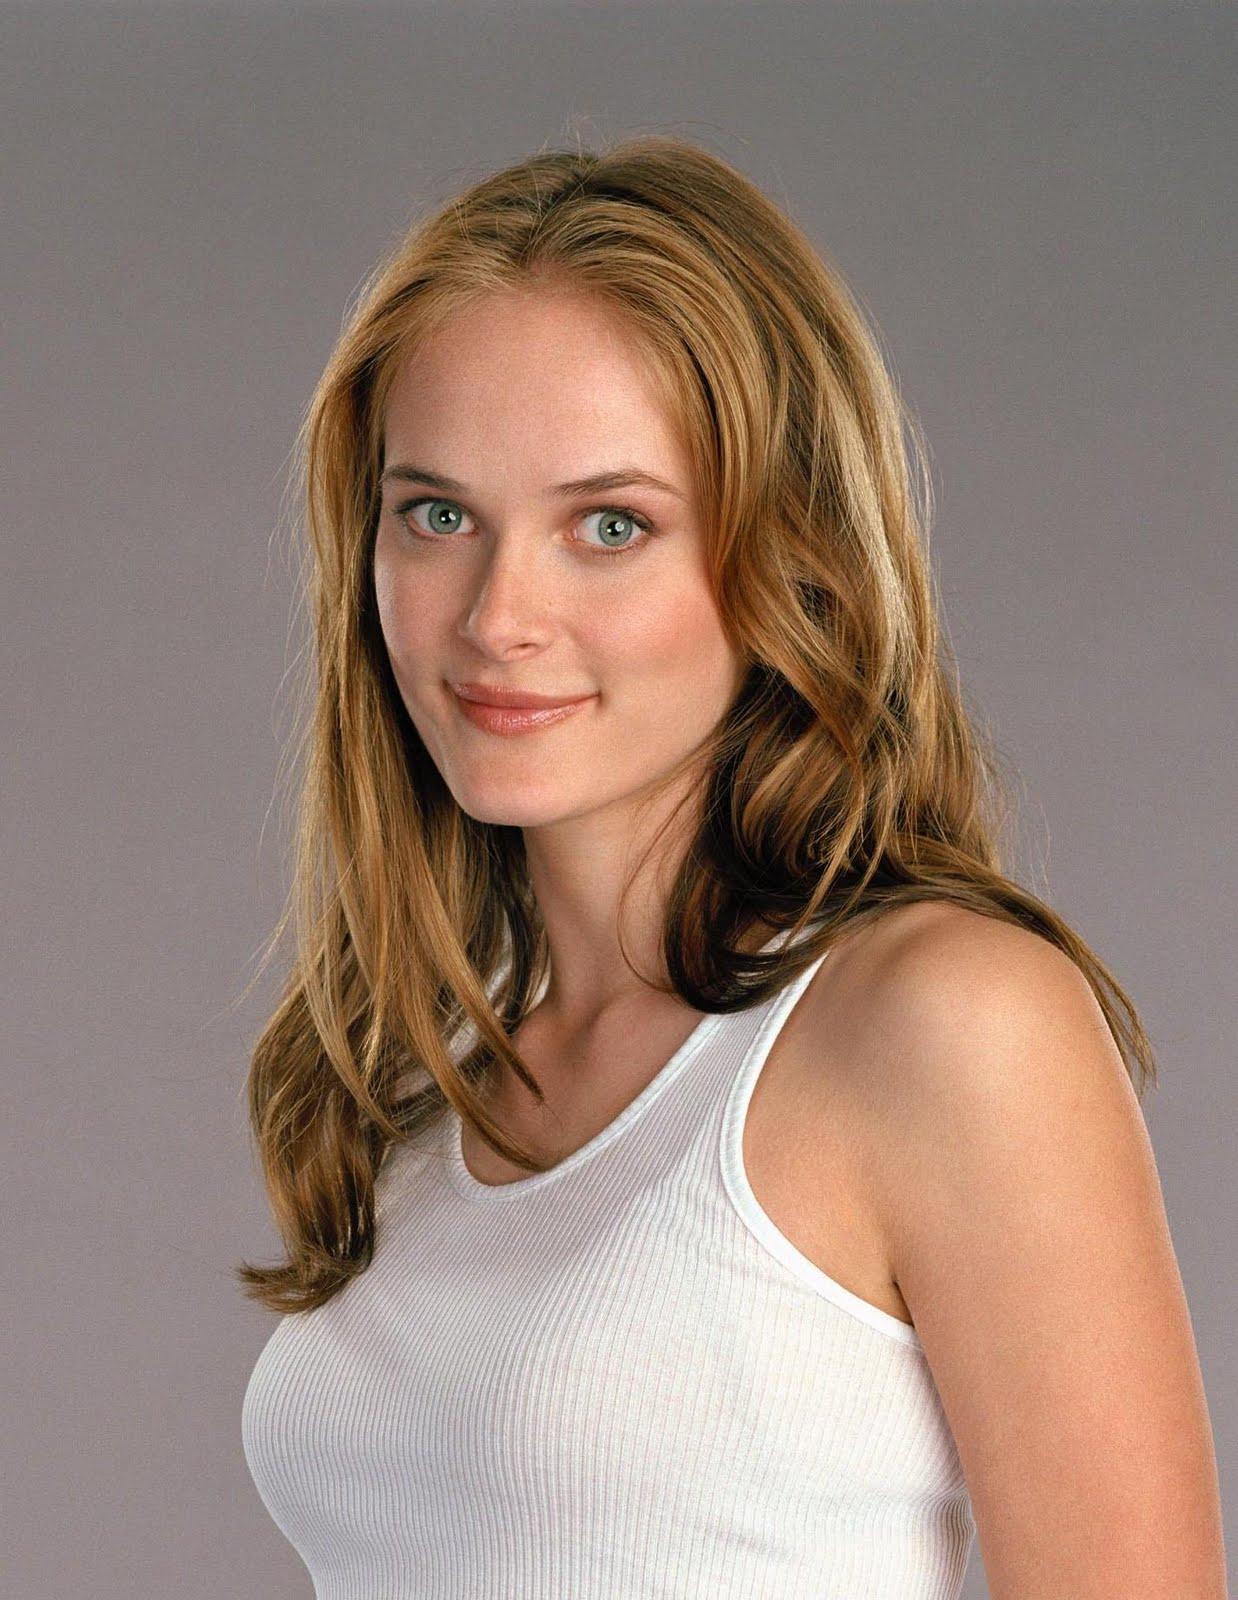 World's Most Beautiful Women: October 2011